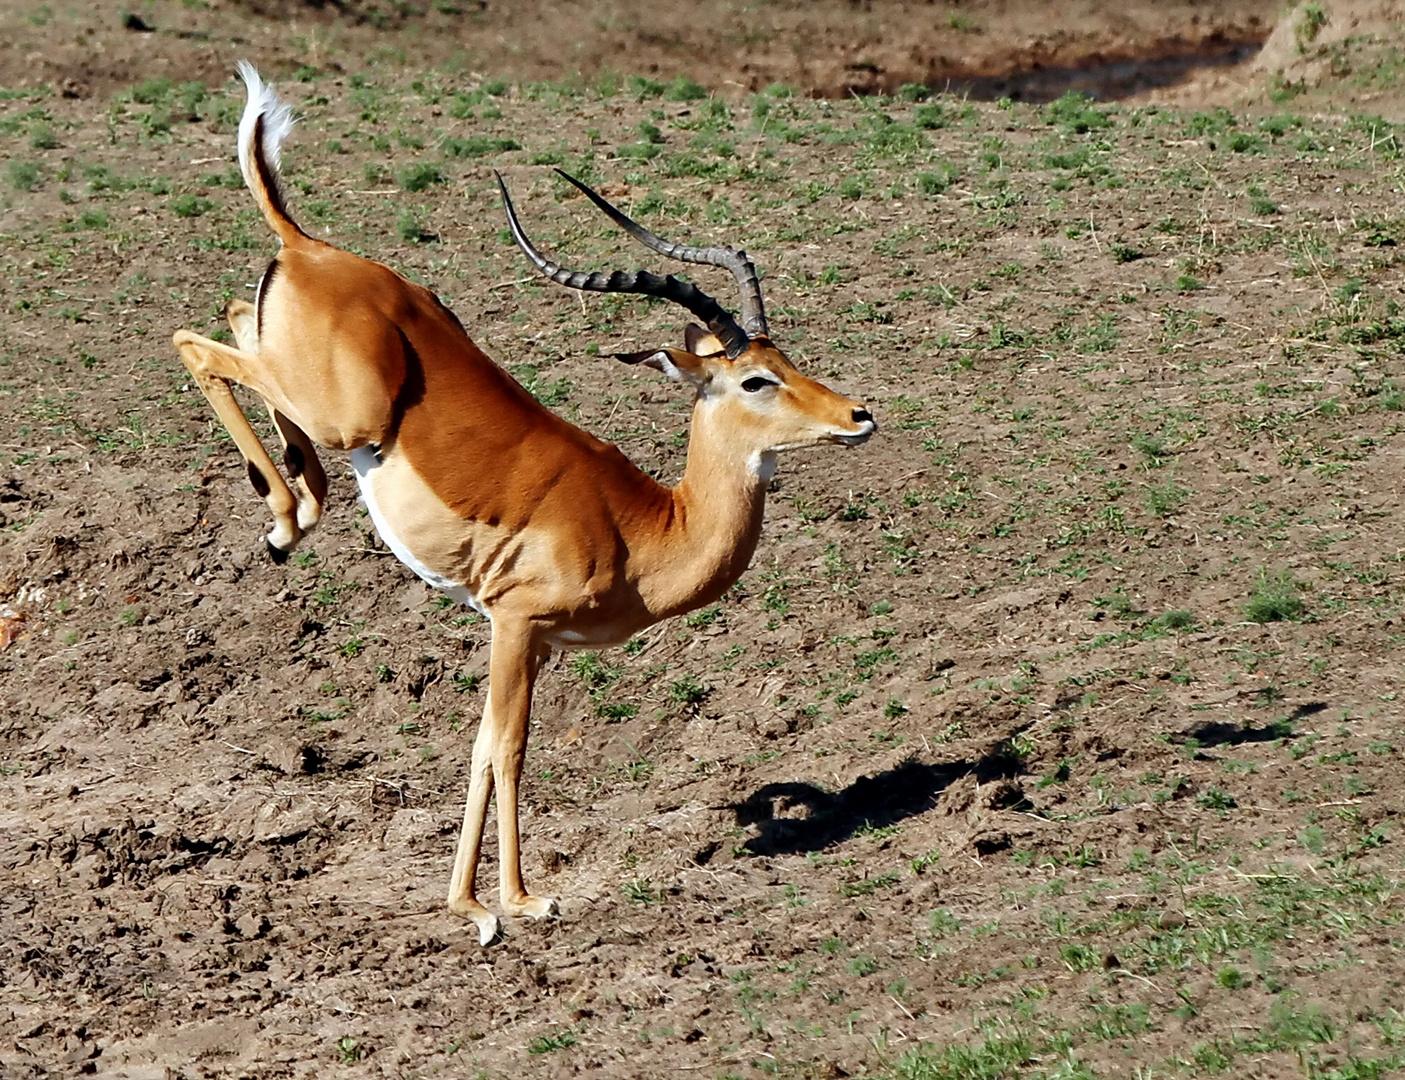 ....Tanz der Impala....3....